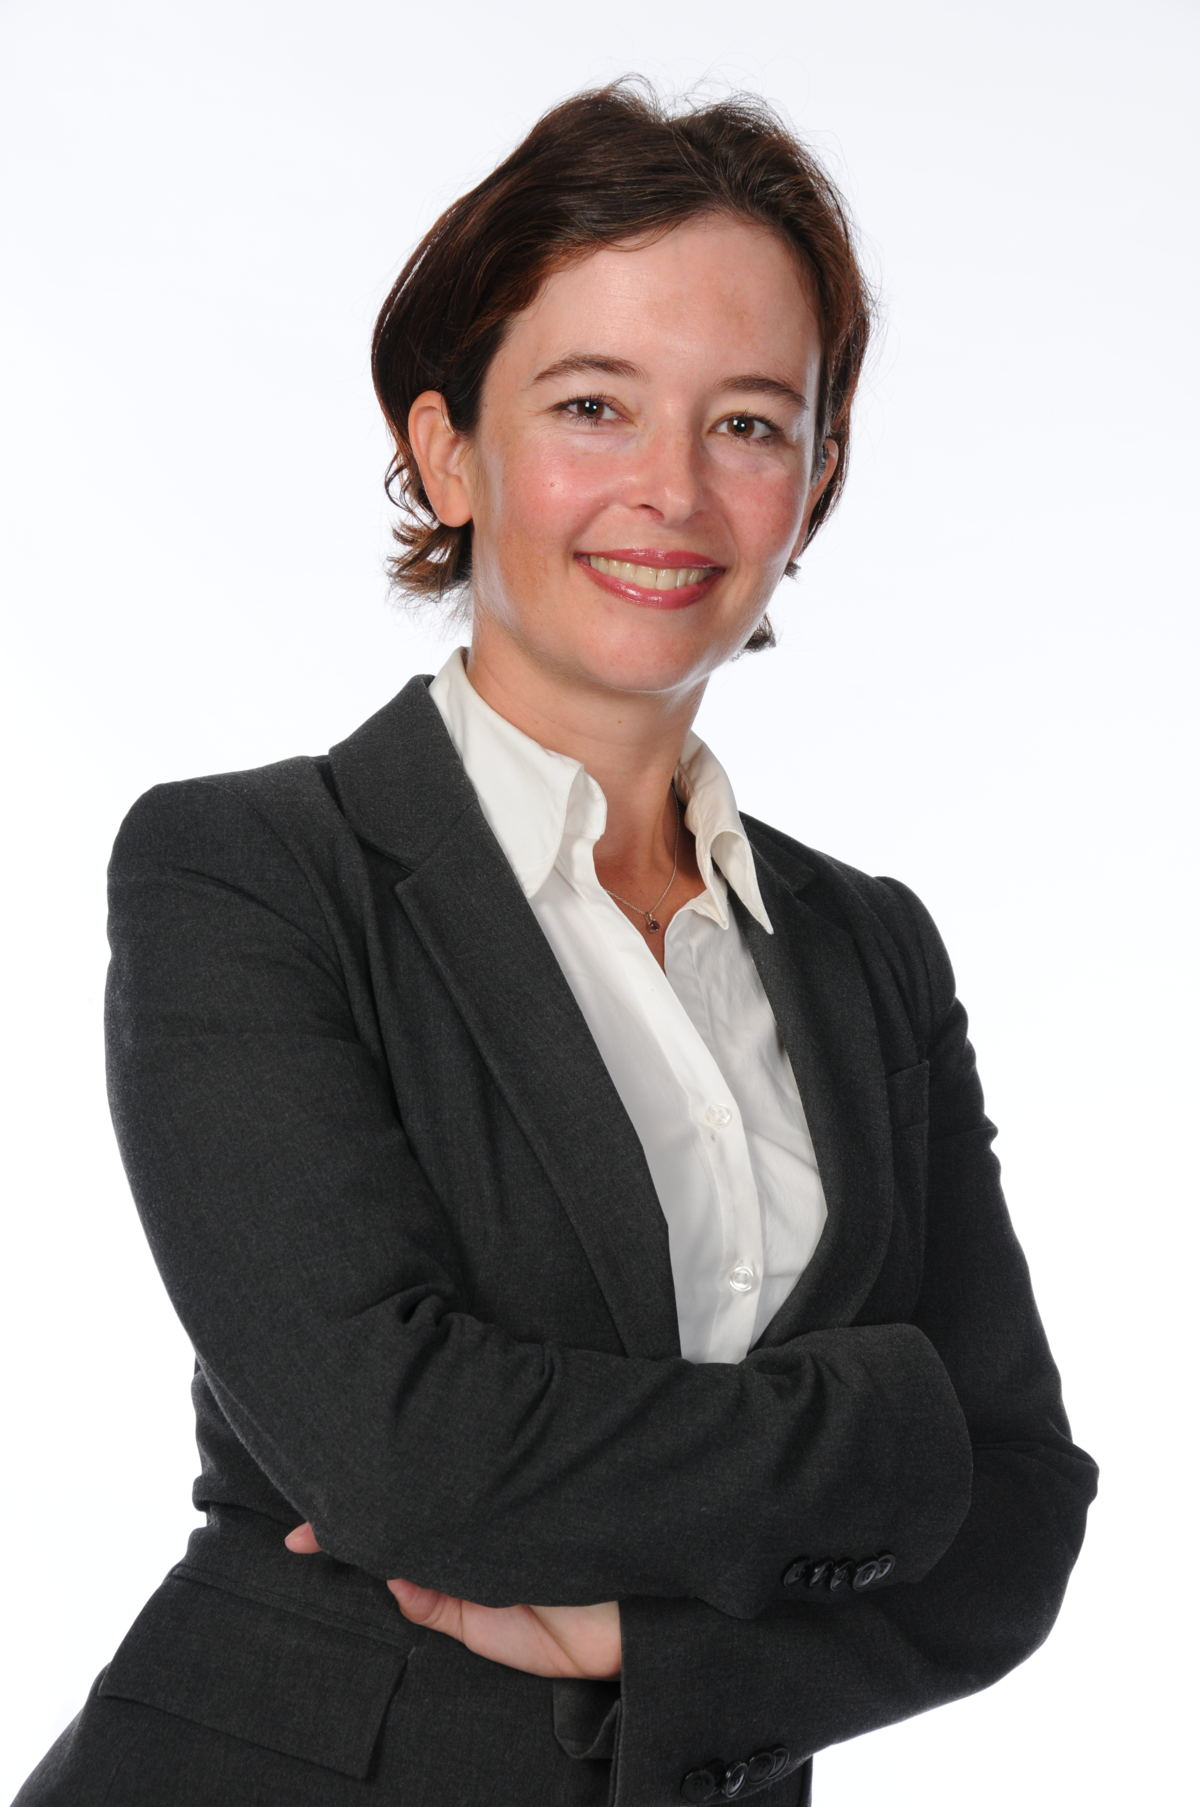 Carly-Jane Figgis